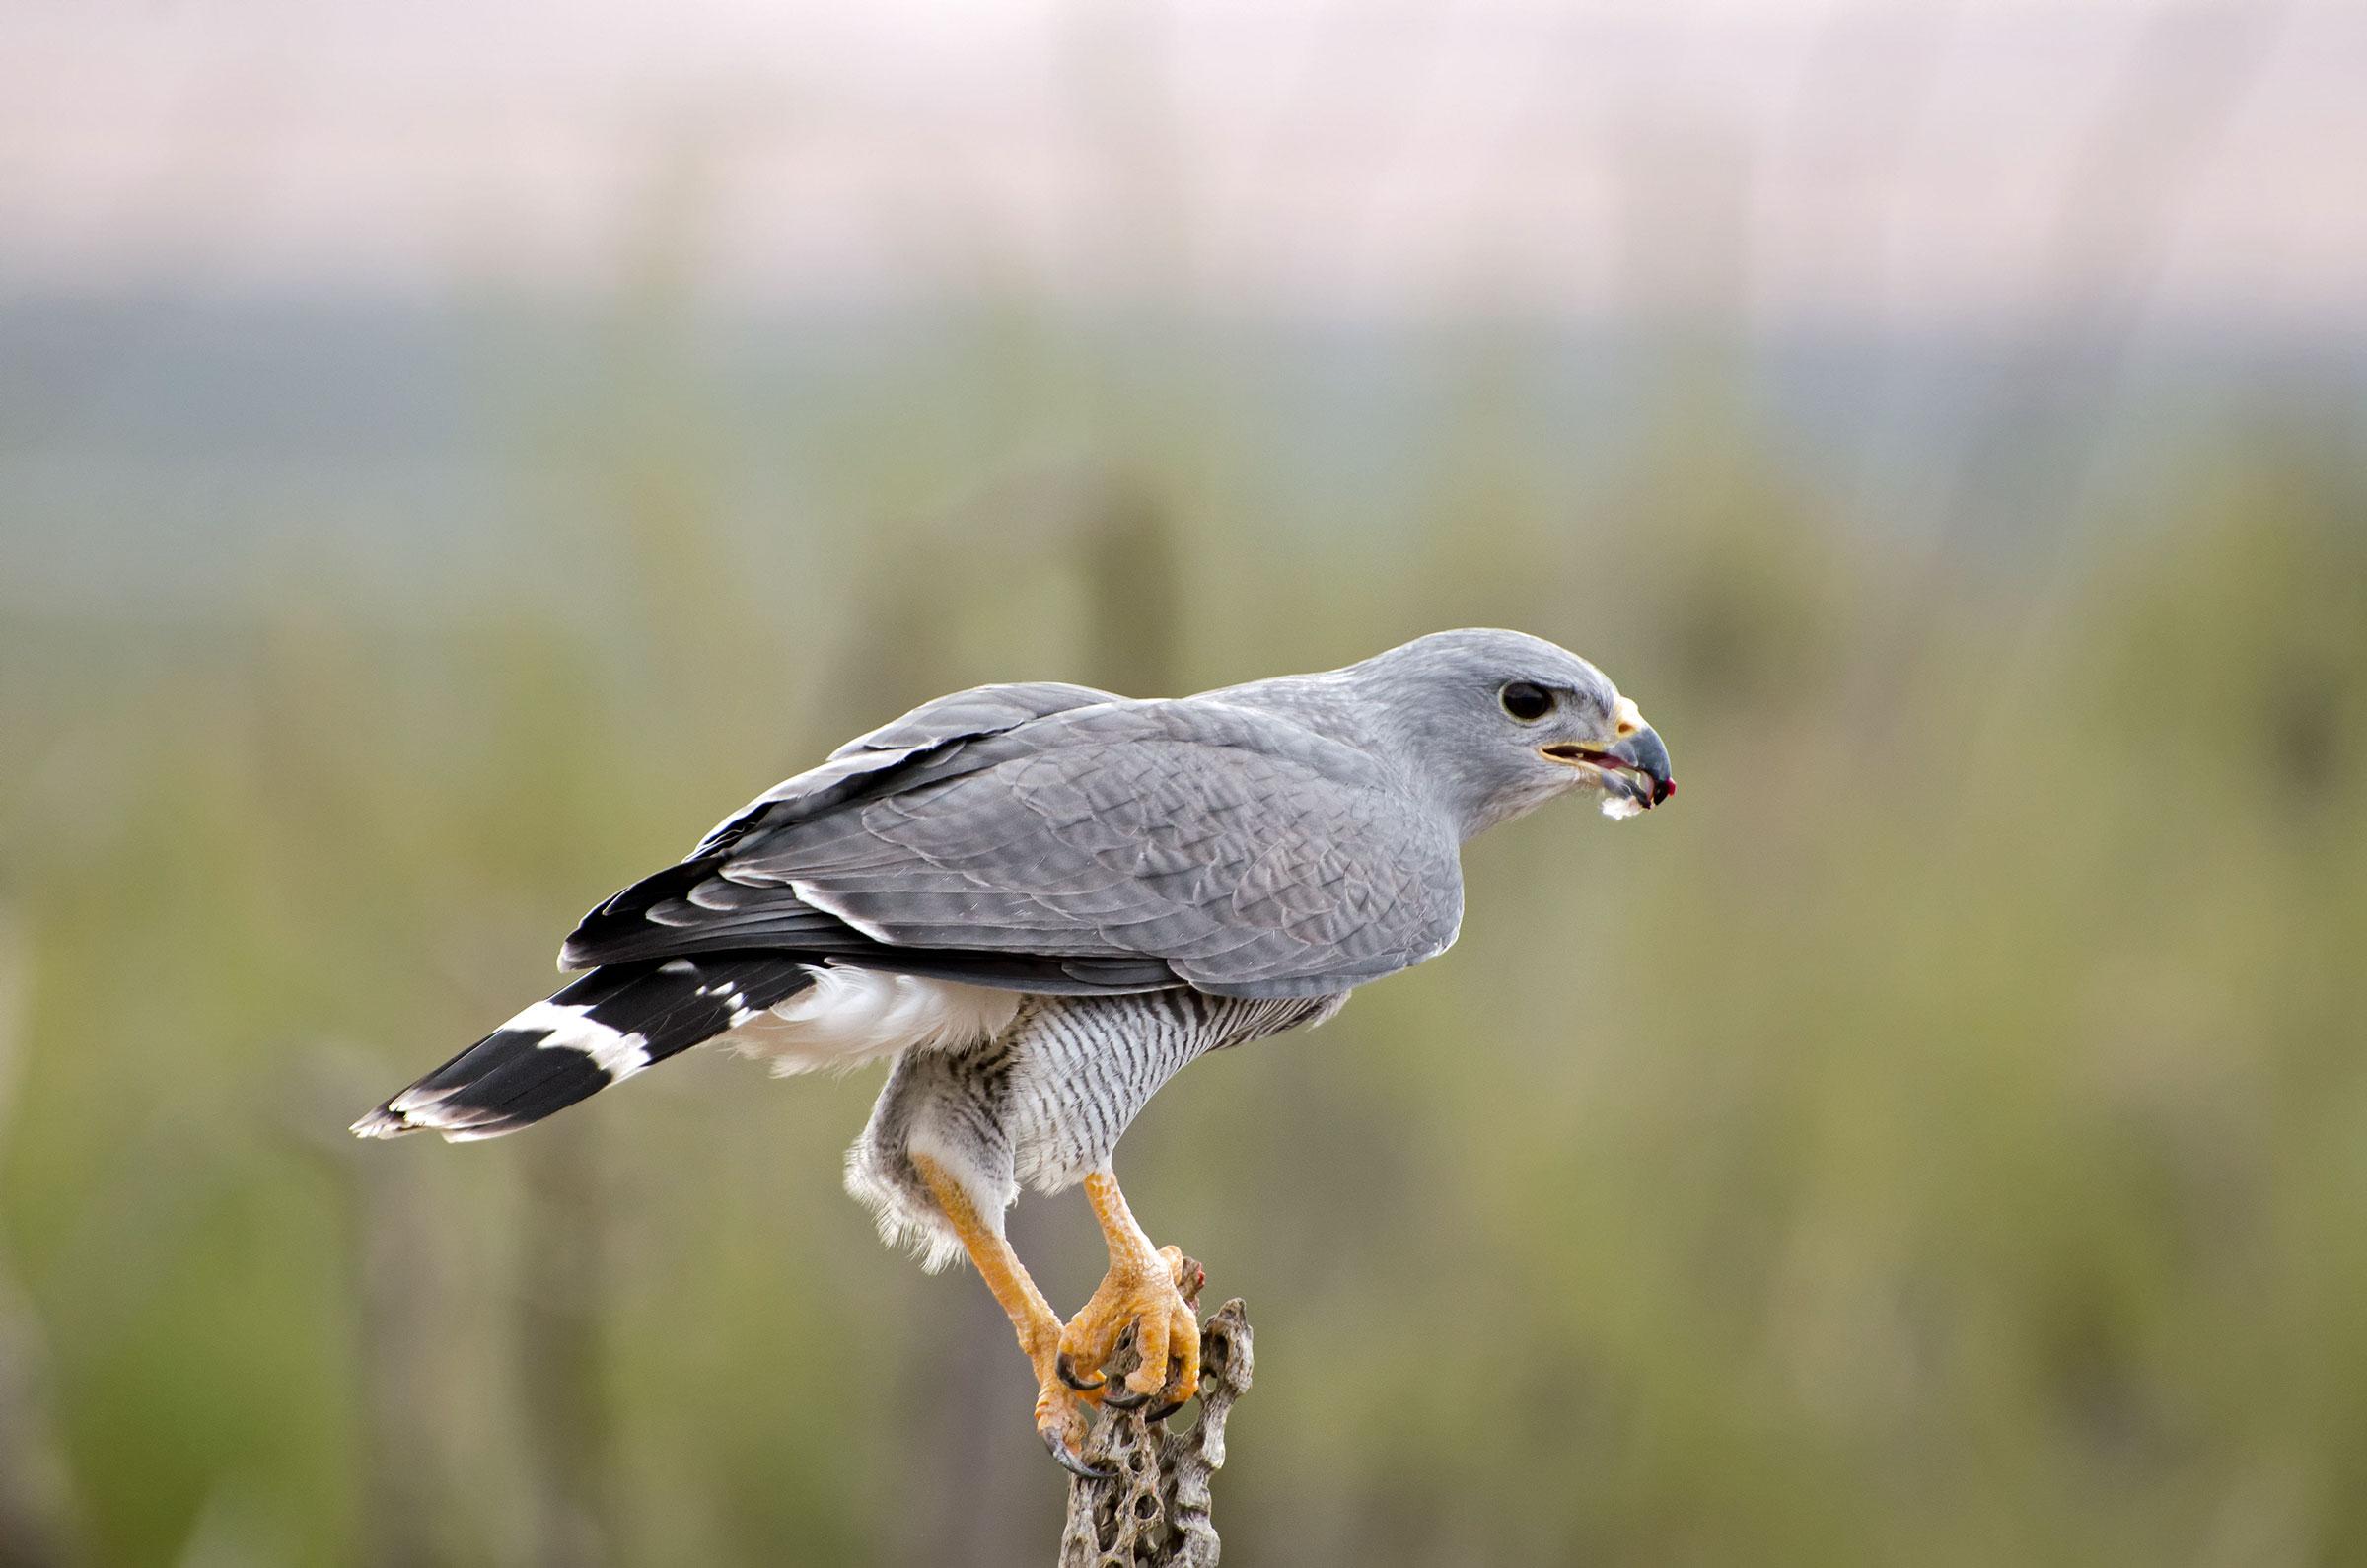 Gray Hawk. Evelyn Harrison/Alamy